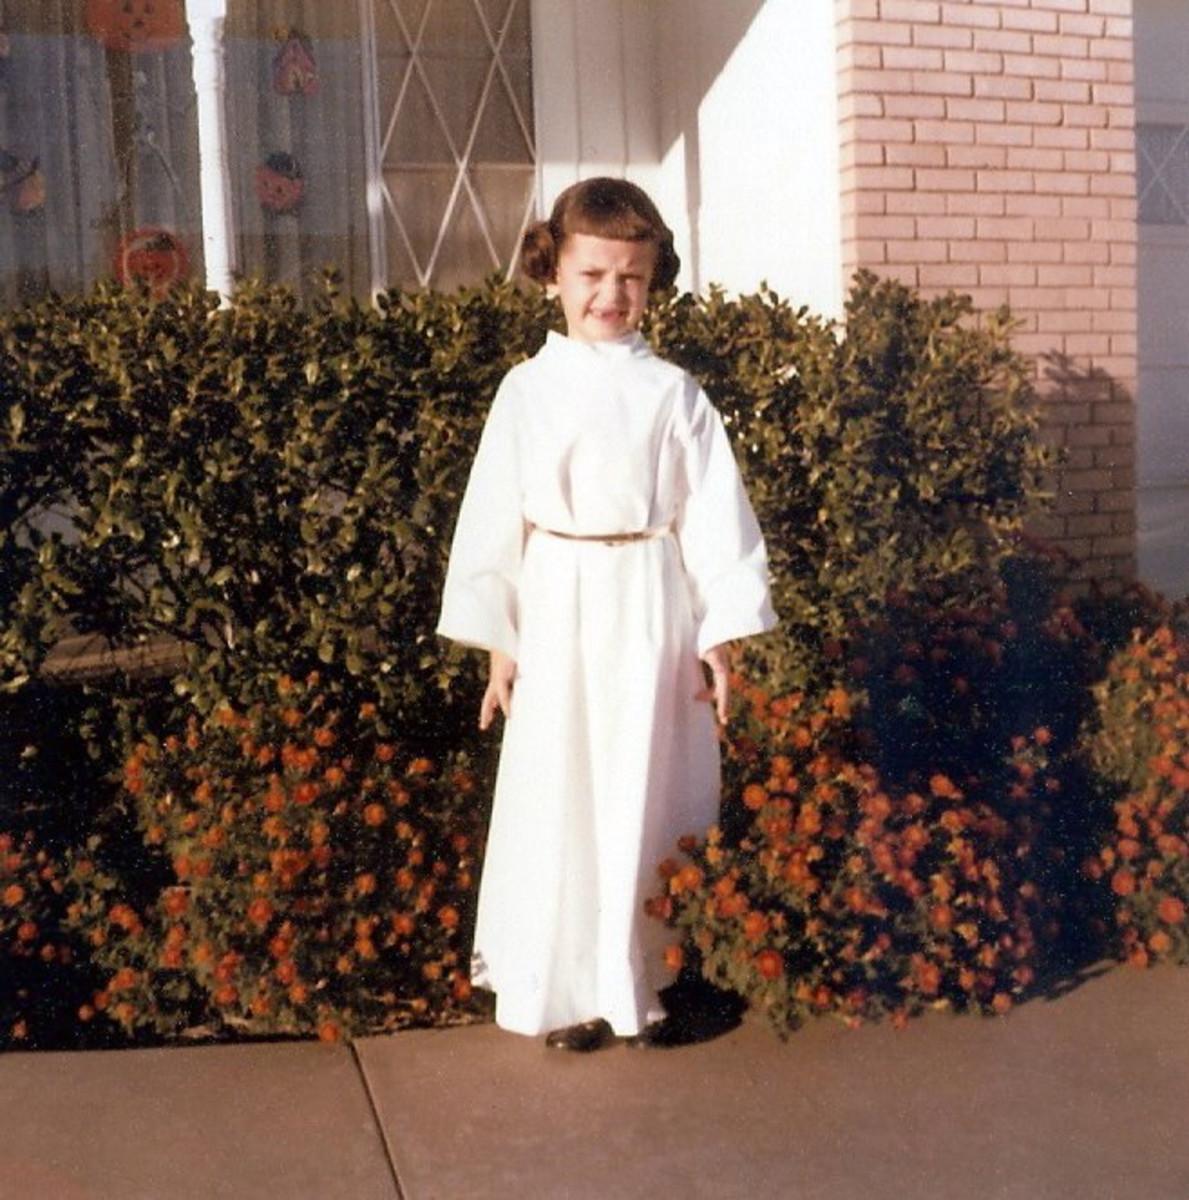 Amy Sturgis as Princess Leia for Halloween.